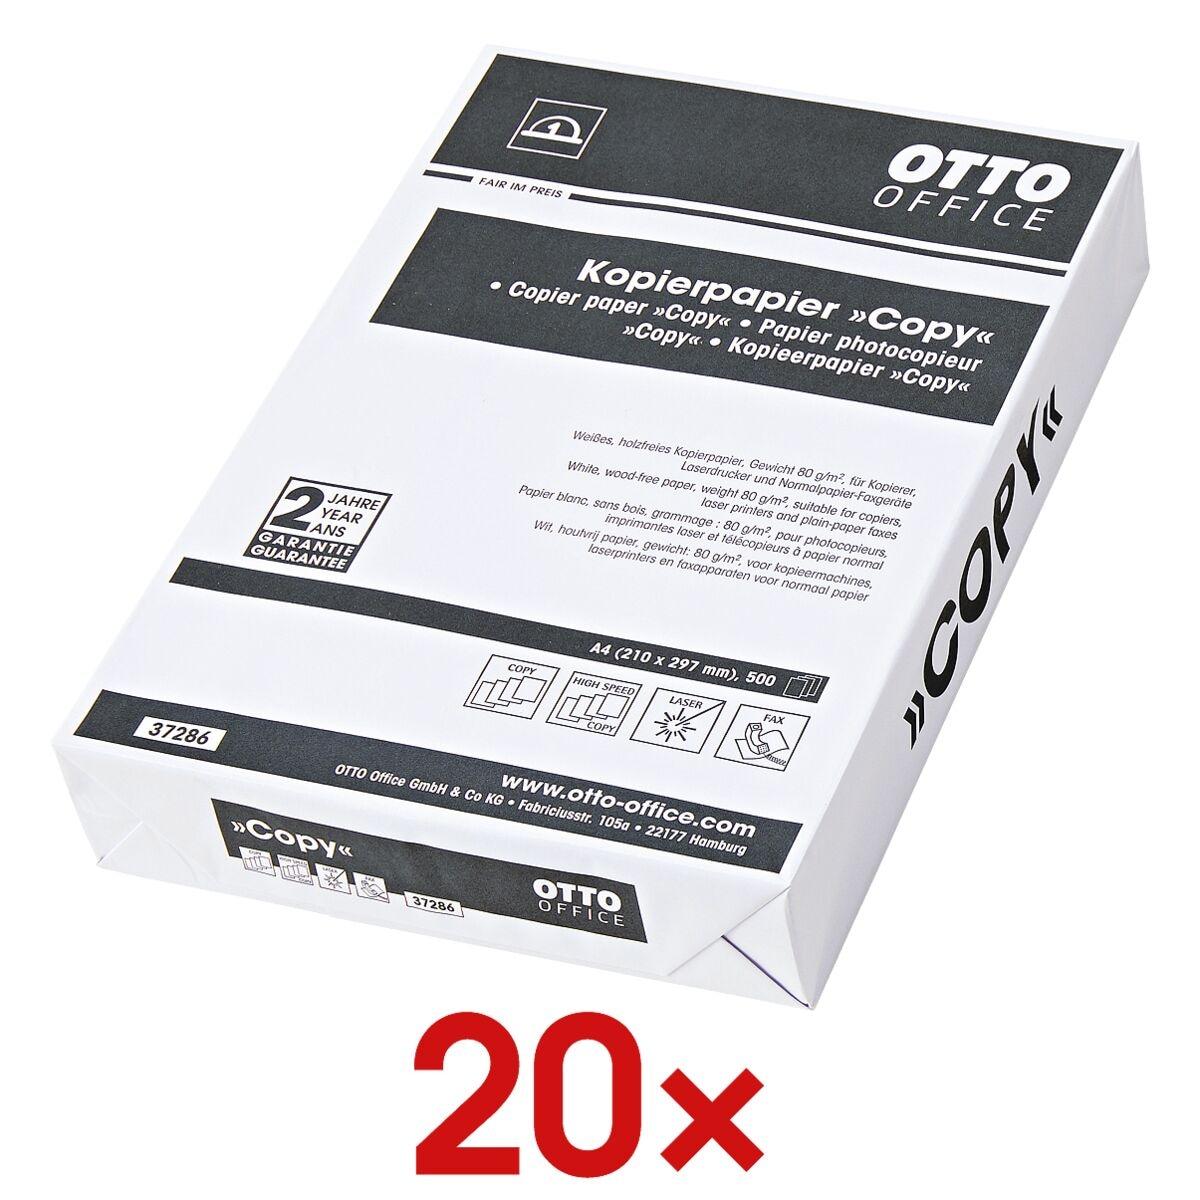 20x Kopieerpapier A4 OTTO Office Budget COPY - 10000 bladen (totaal), 80g/qm